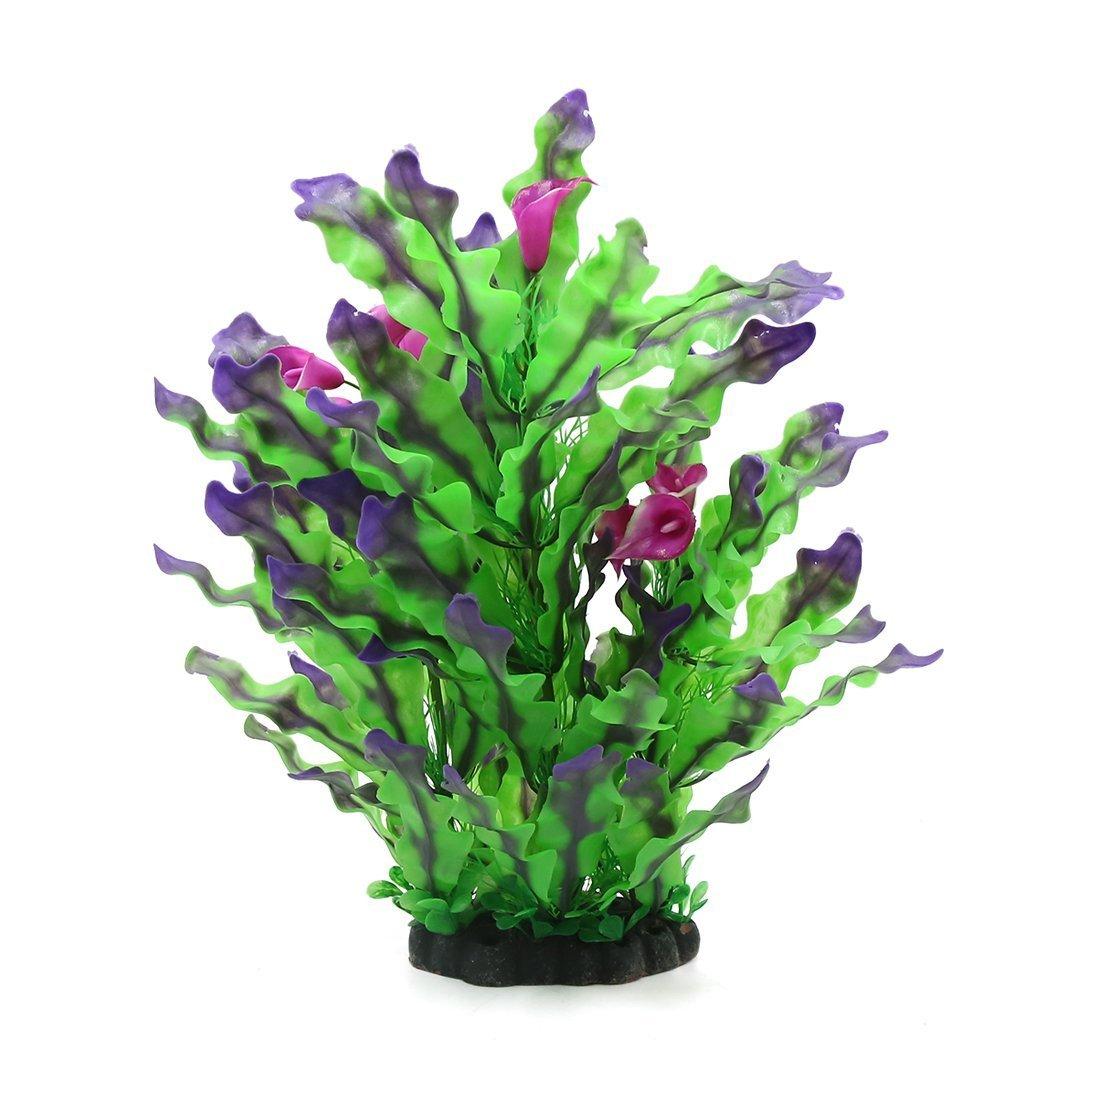 Uxcell a17040100ux0480 Fish Tank Aquatic Simulation Plastic Plant Grass Lawn Decoration Green Purple